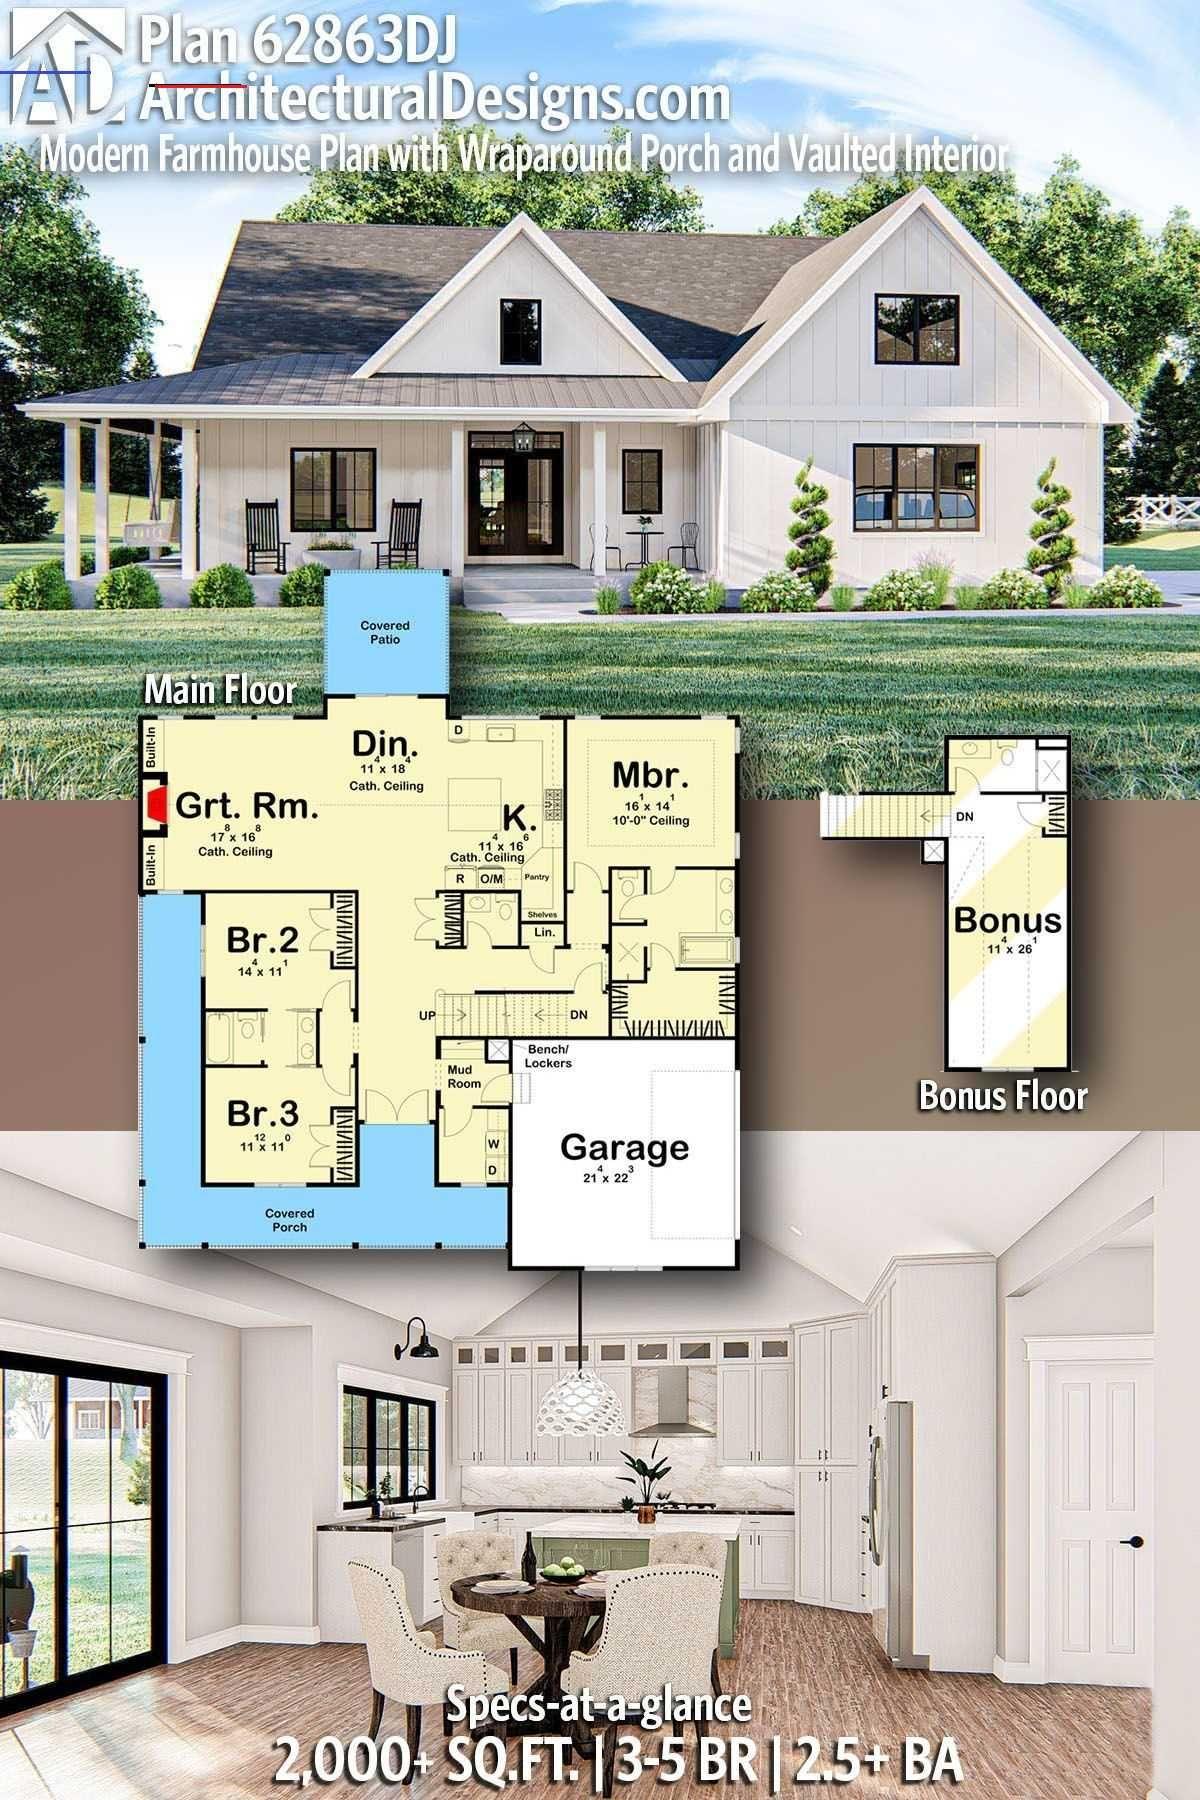 Smallmodernfarmhouseplans In 2020 Small Farmhouse Plans Modern Farmhouse Plans House Plans Farmhouse